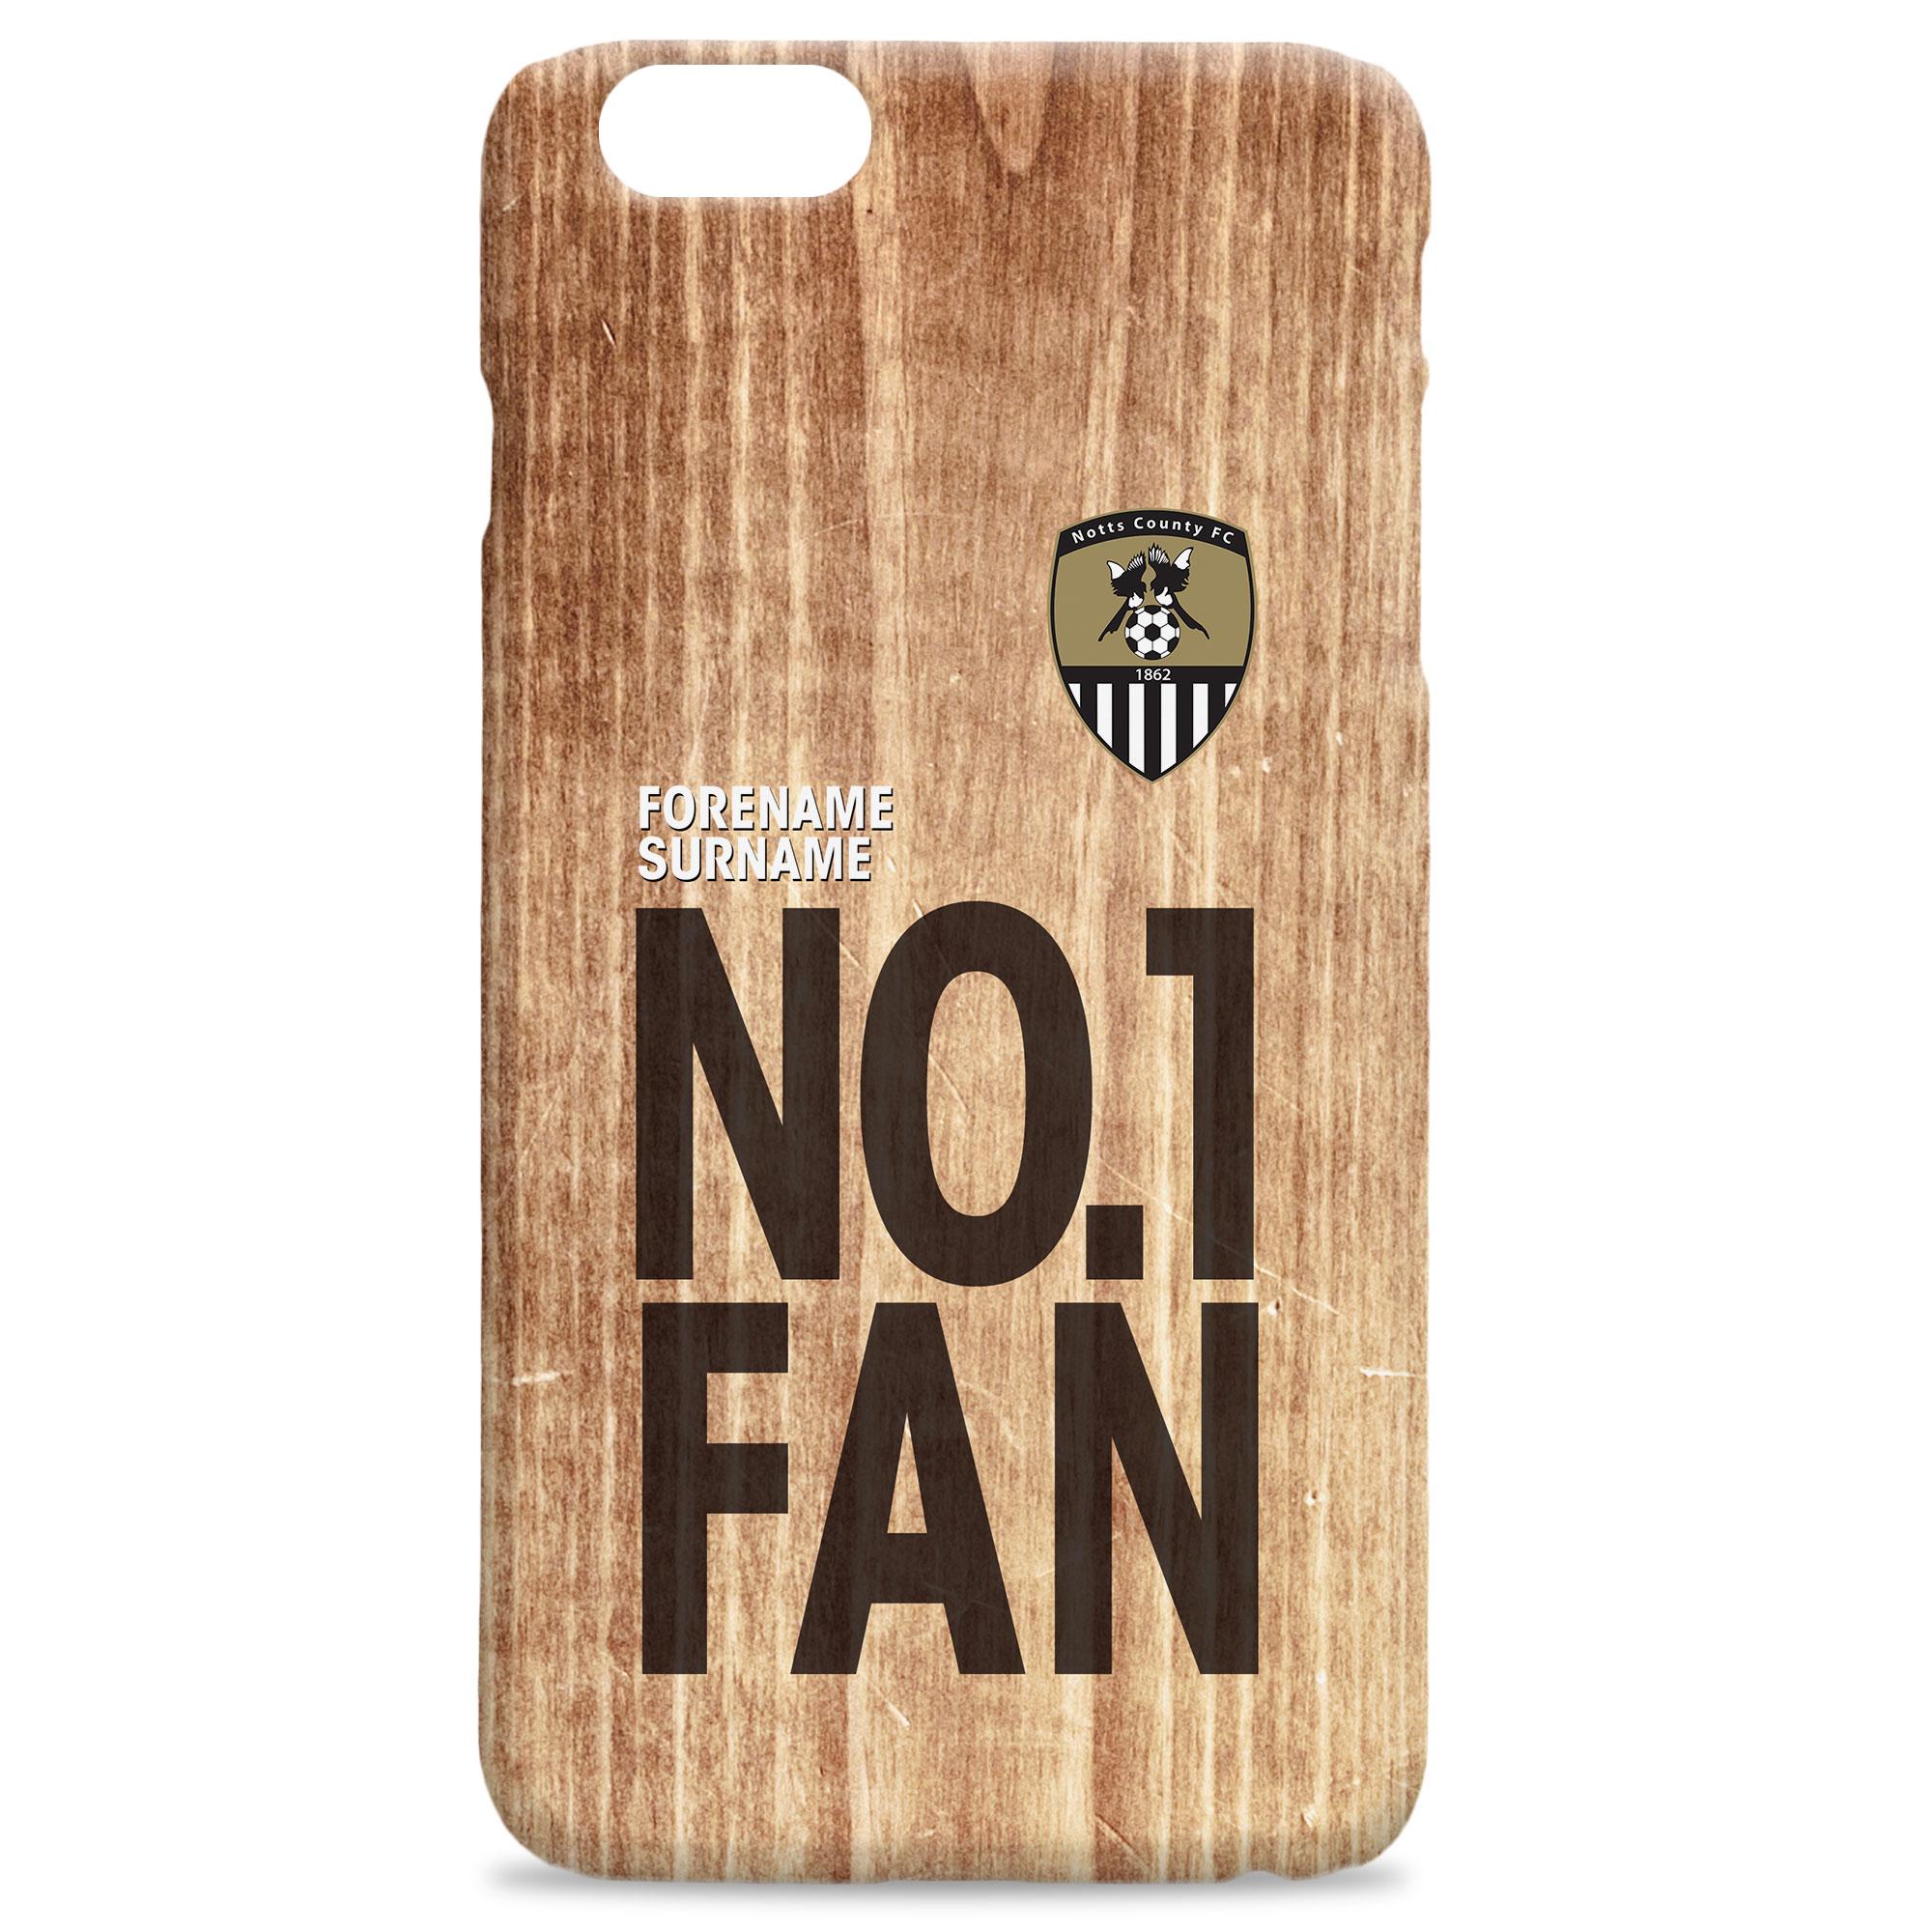 Notts County FC No 1 Fan Hard Back Phone Case